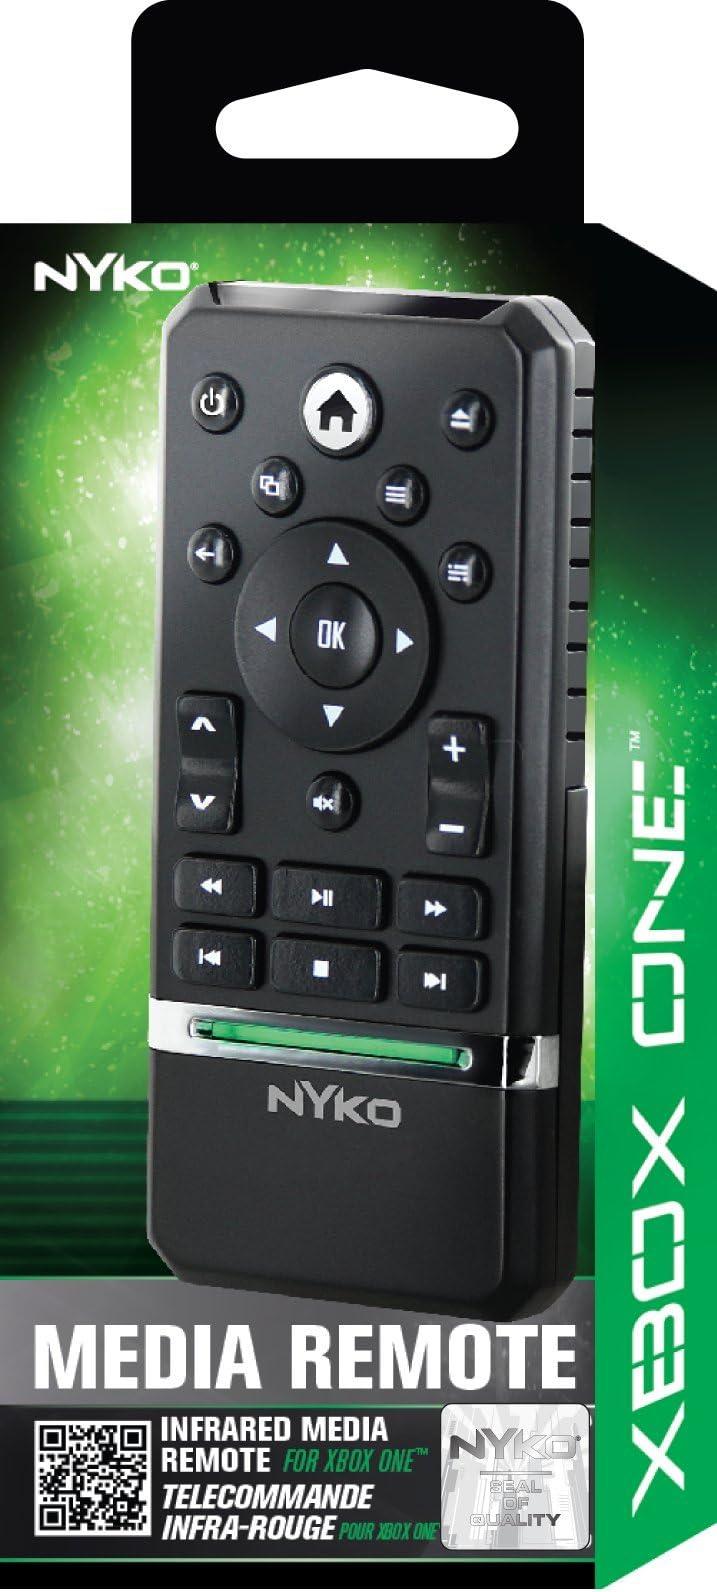 Nyko Media Remote